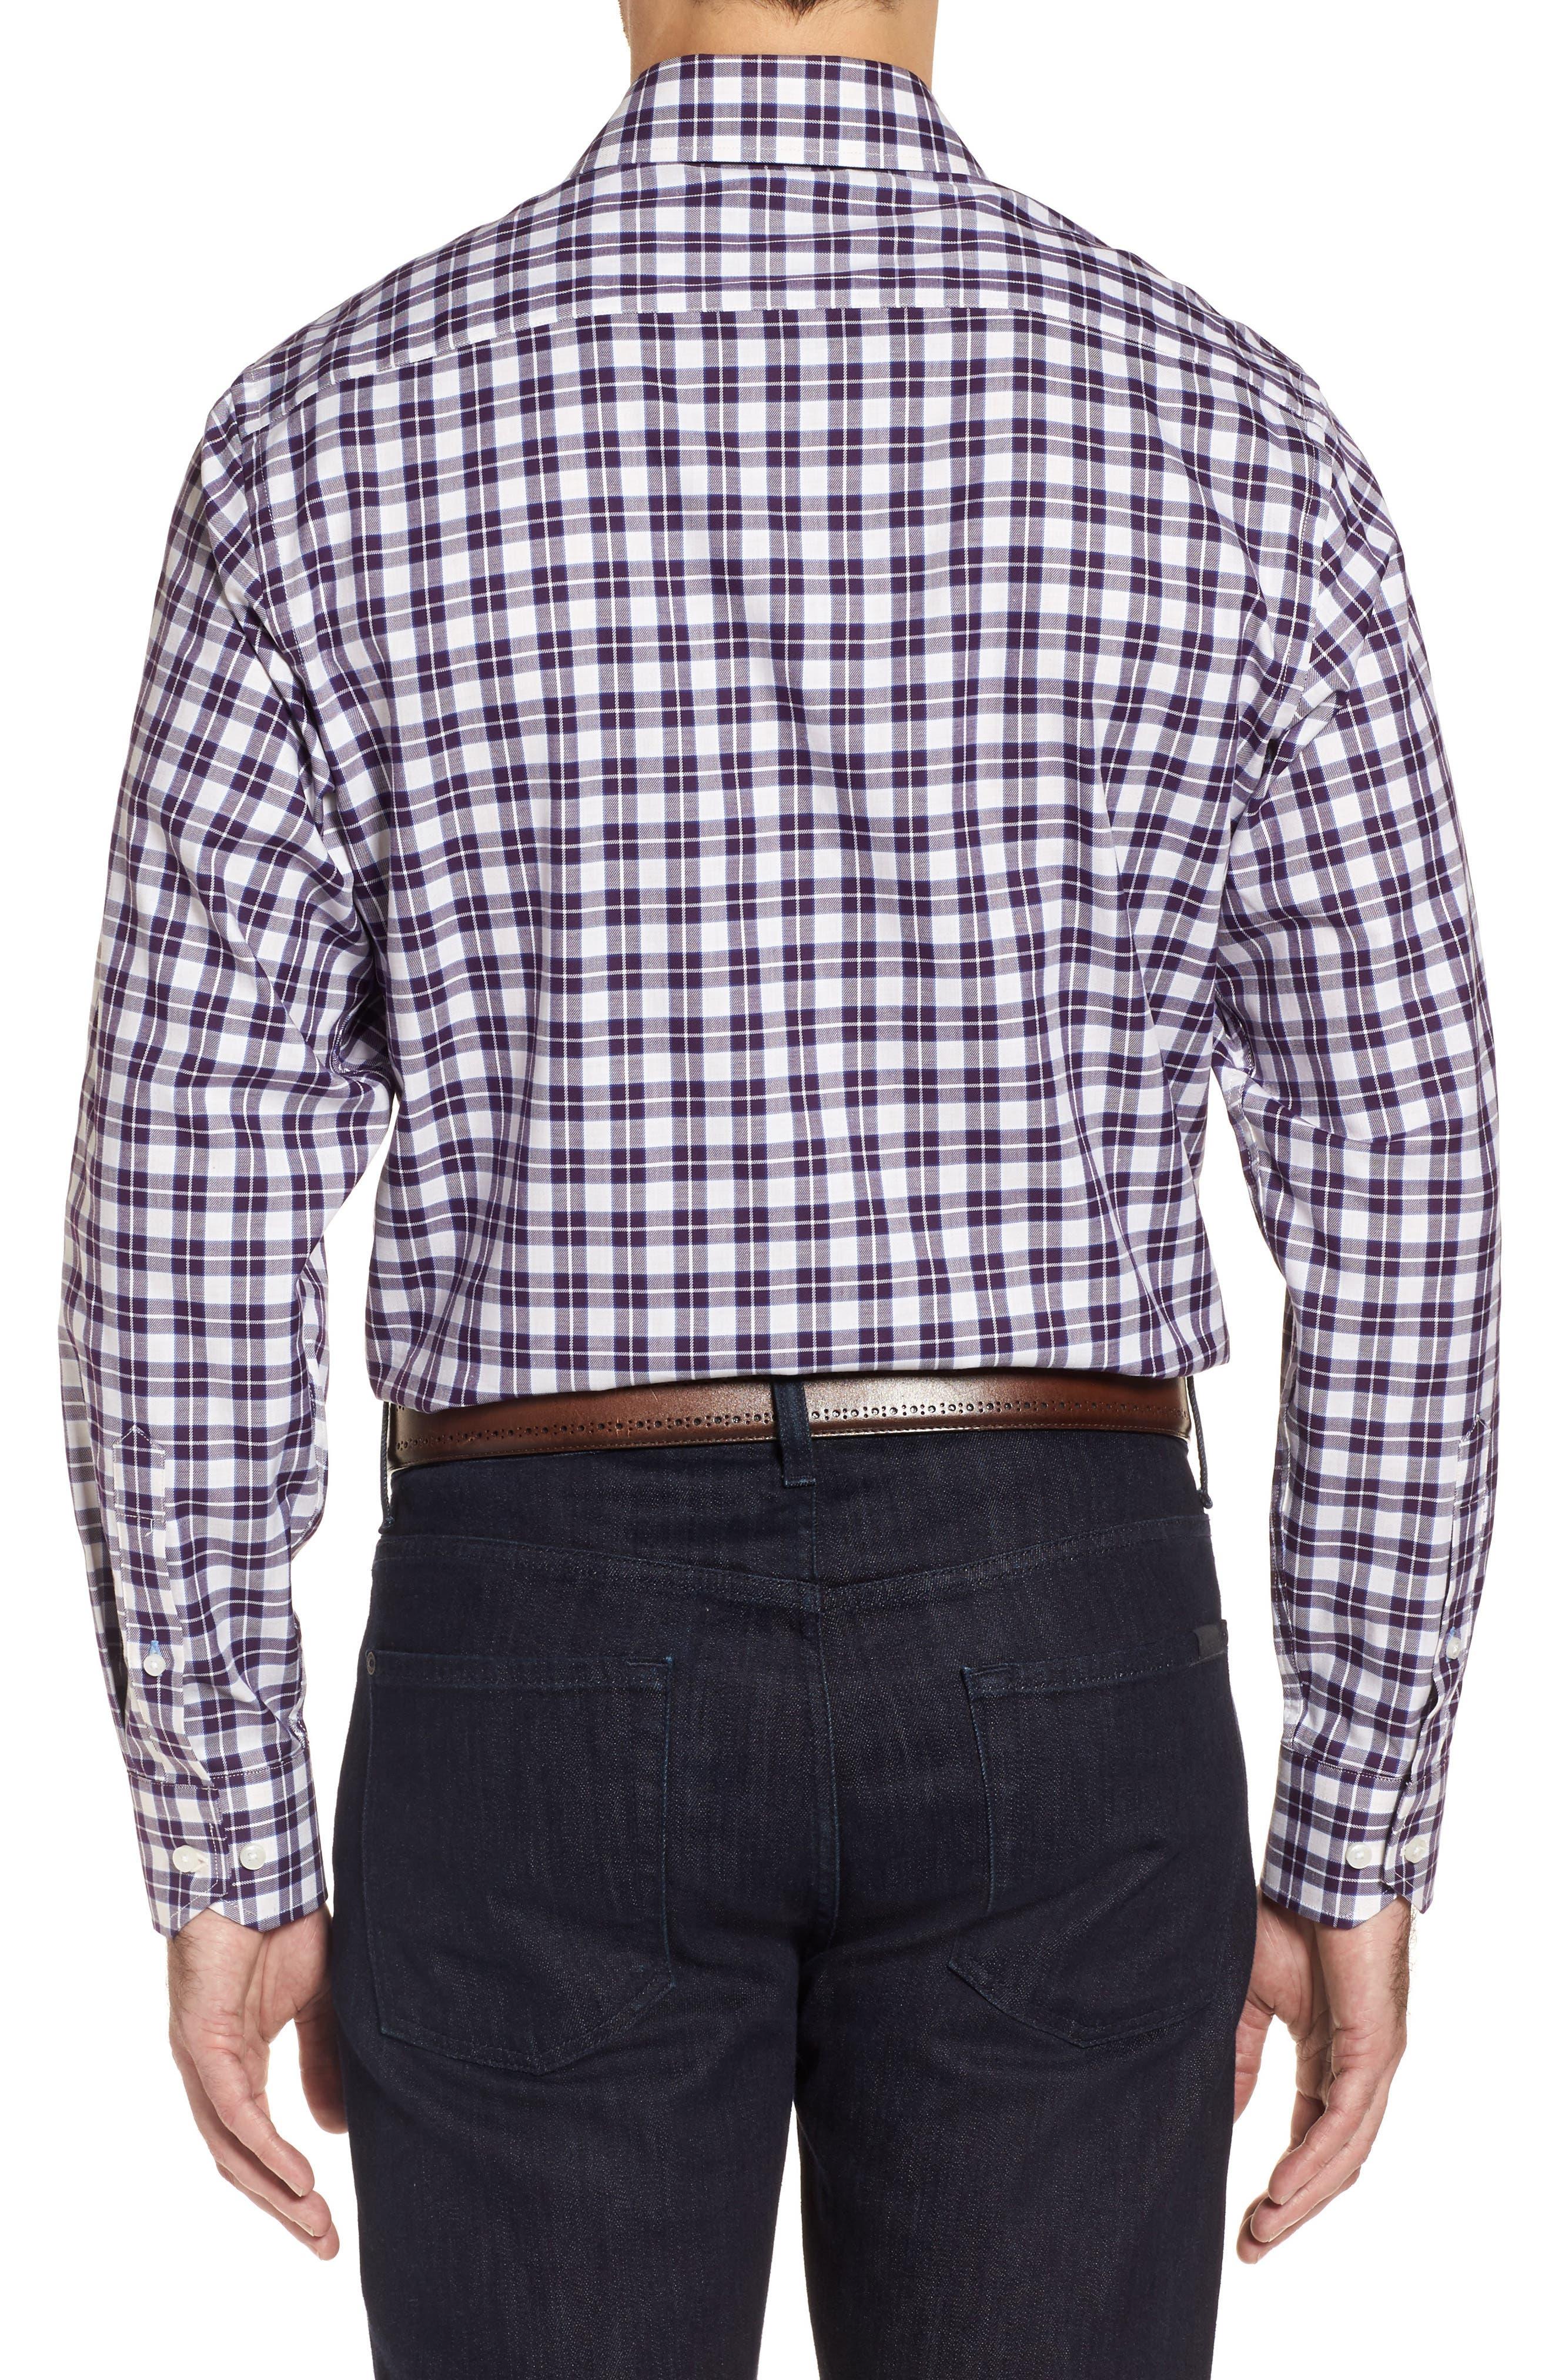 Alternate Image 2  - TailorByrd Cameron Regular Fit Plaid Sport Shirt